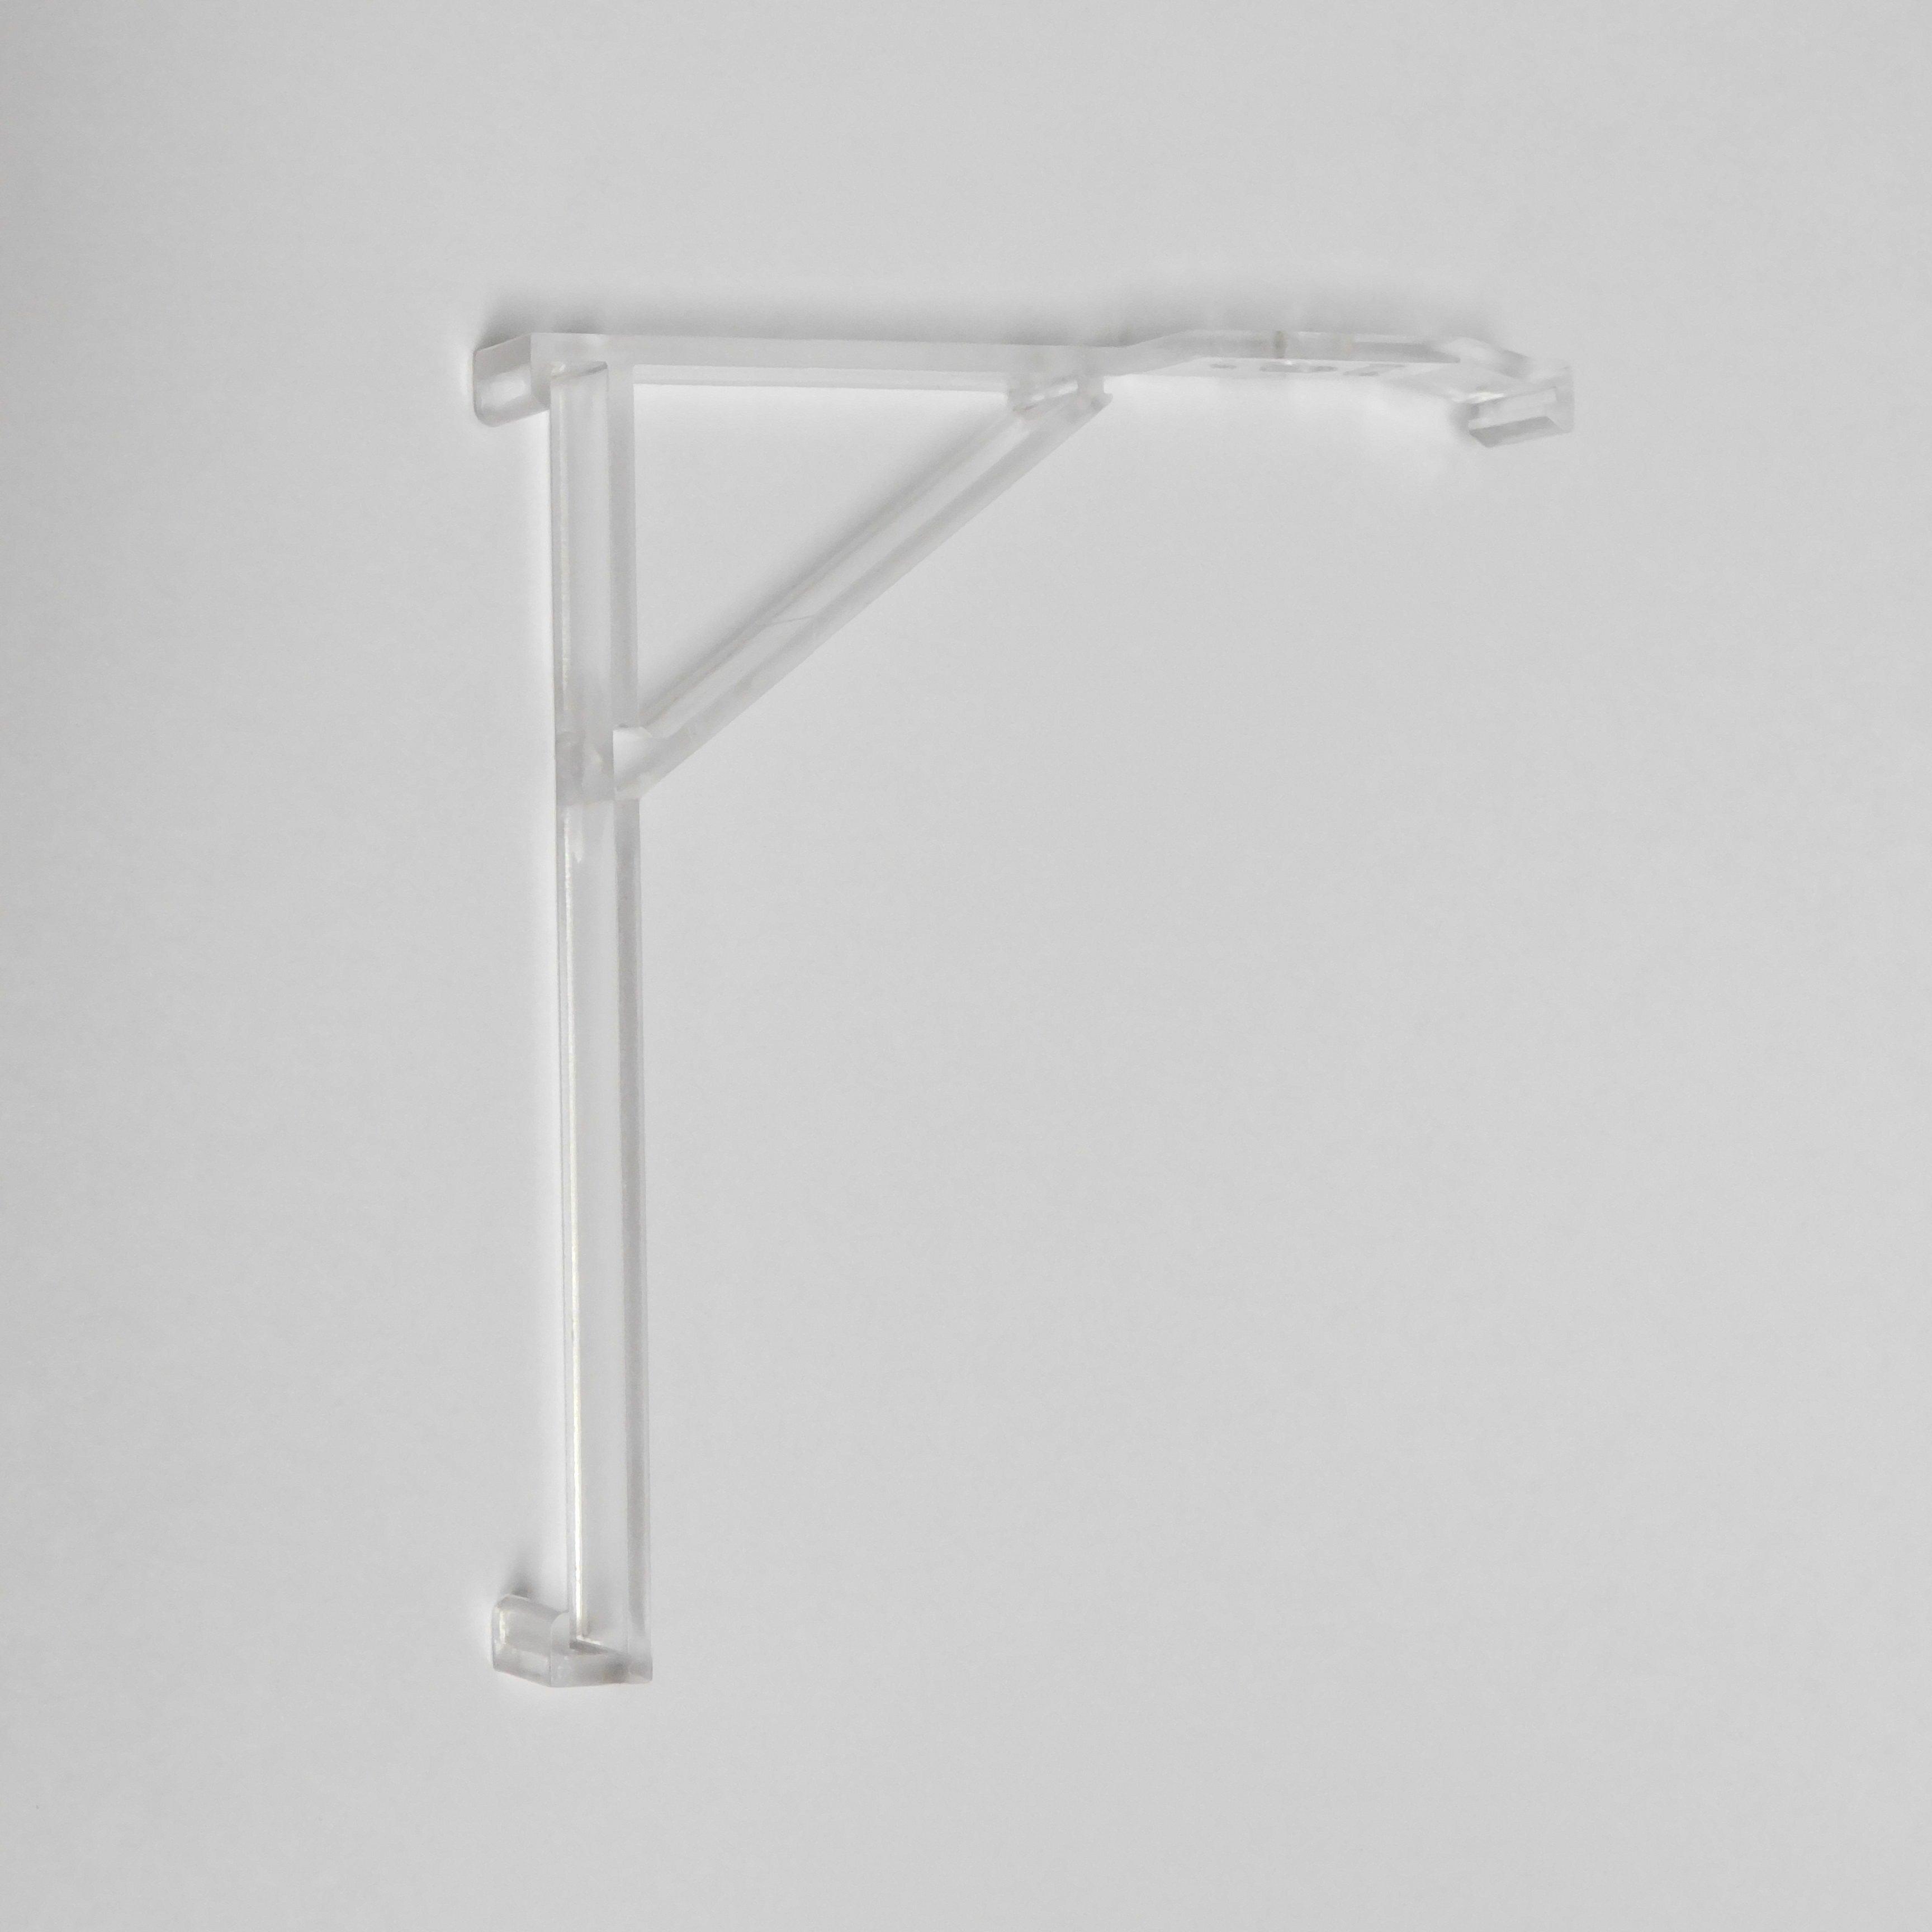 1 3 8 Inch Vertical Blind Panel Valance Clip 2